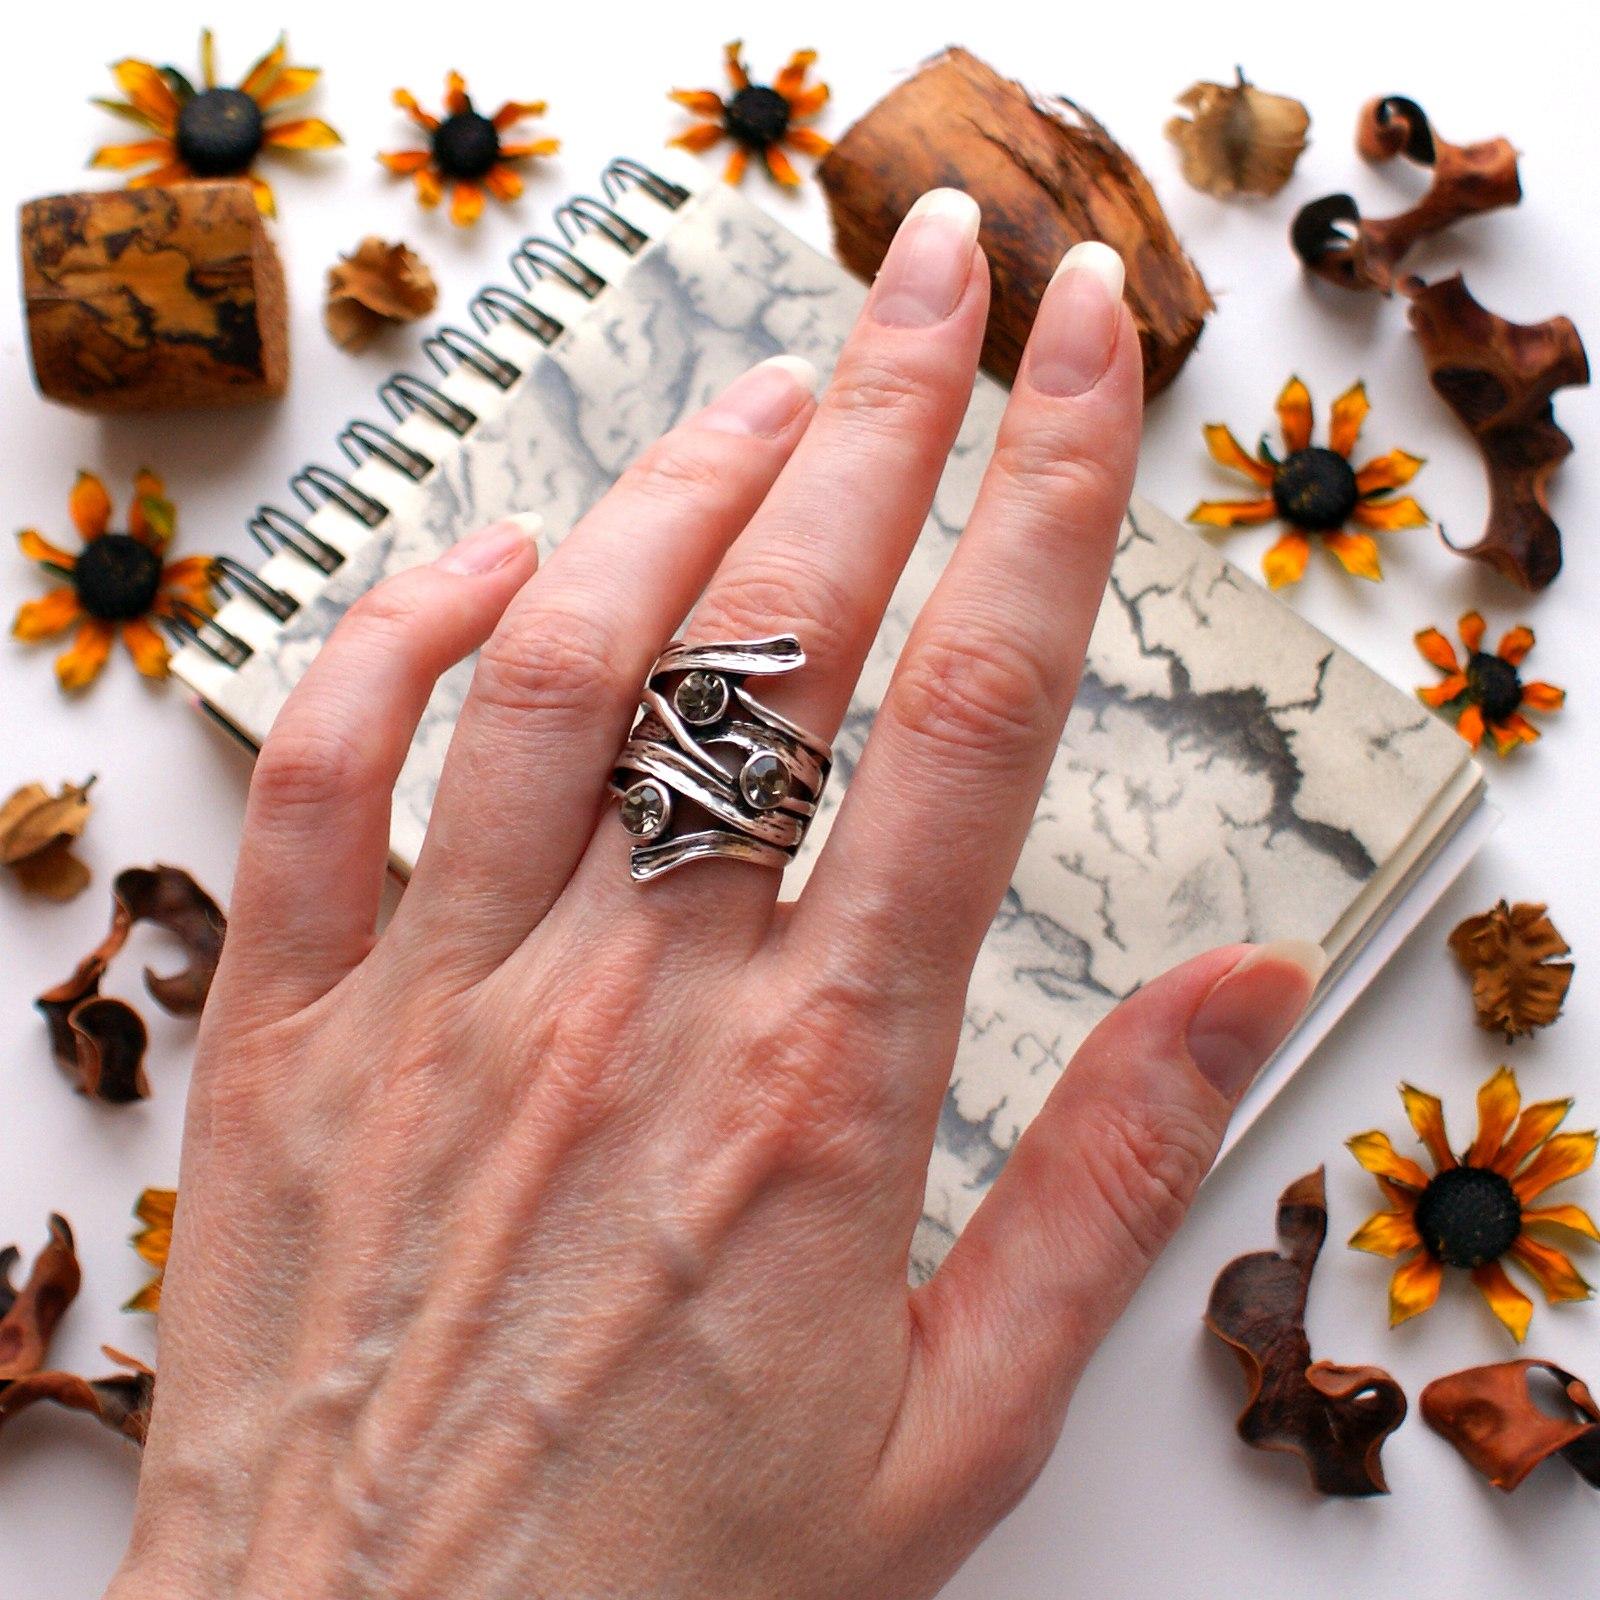 Необычное кольцо из магазина Viennois official store